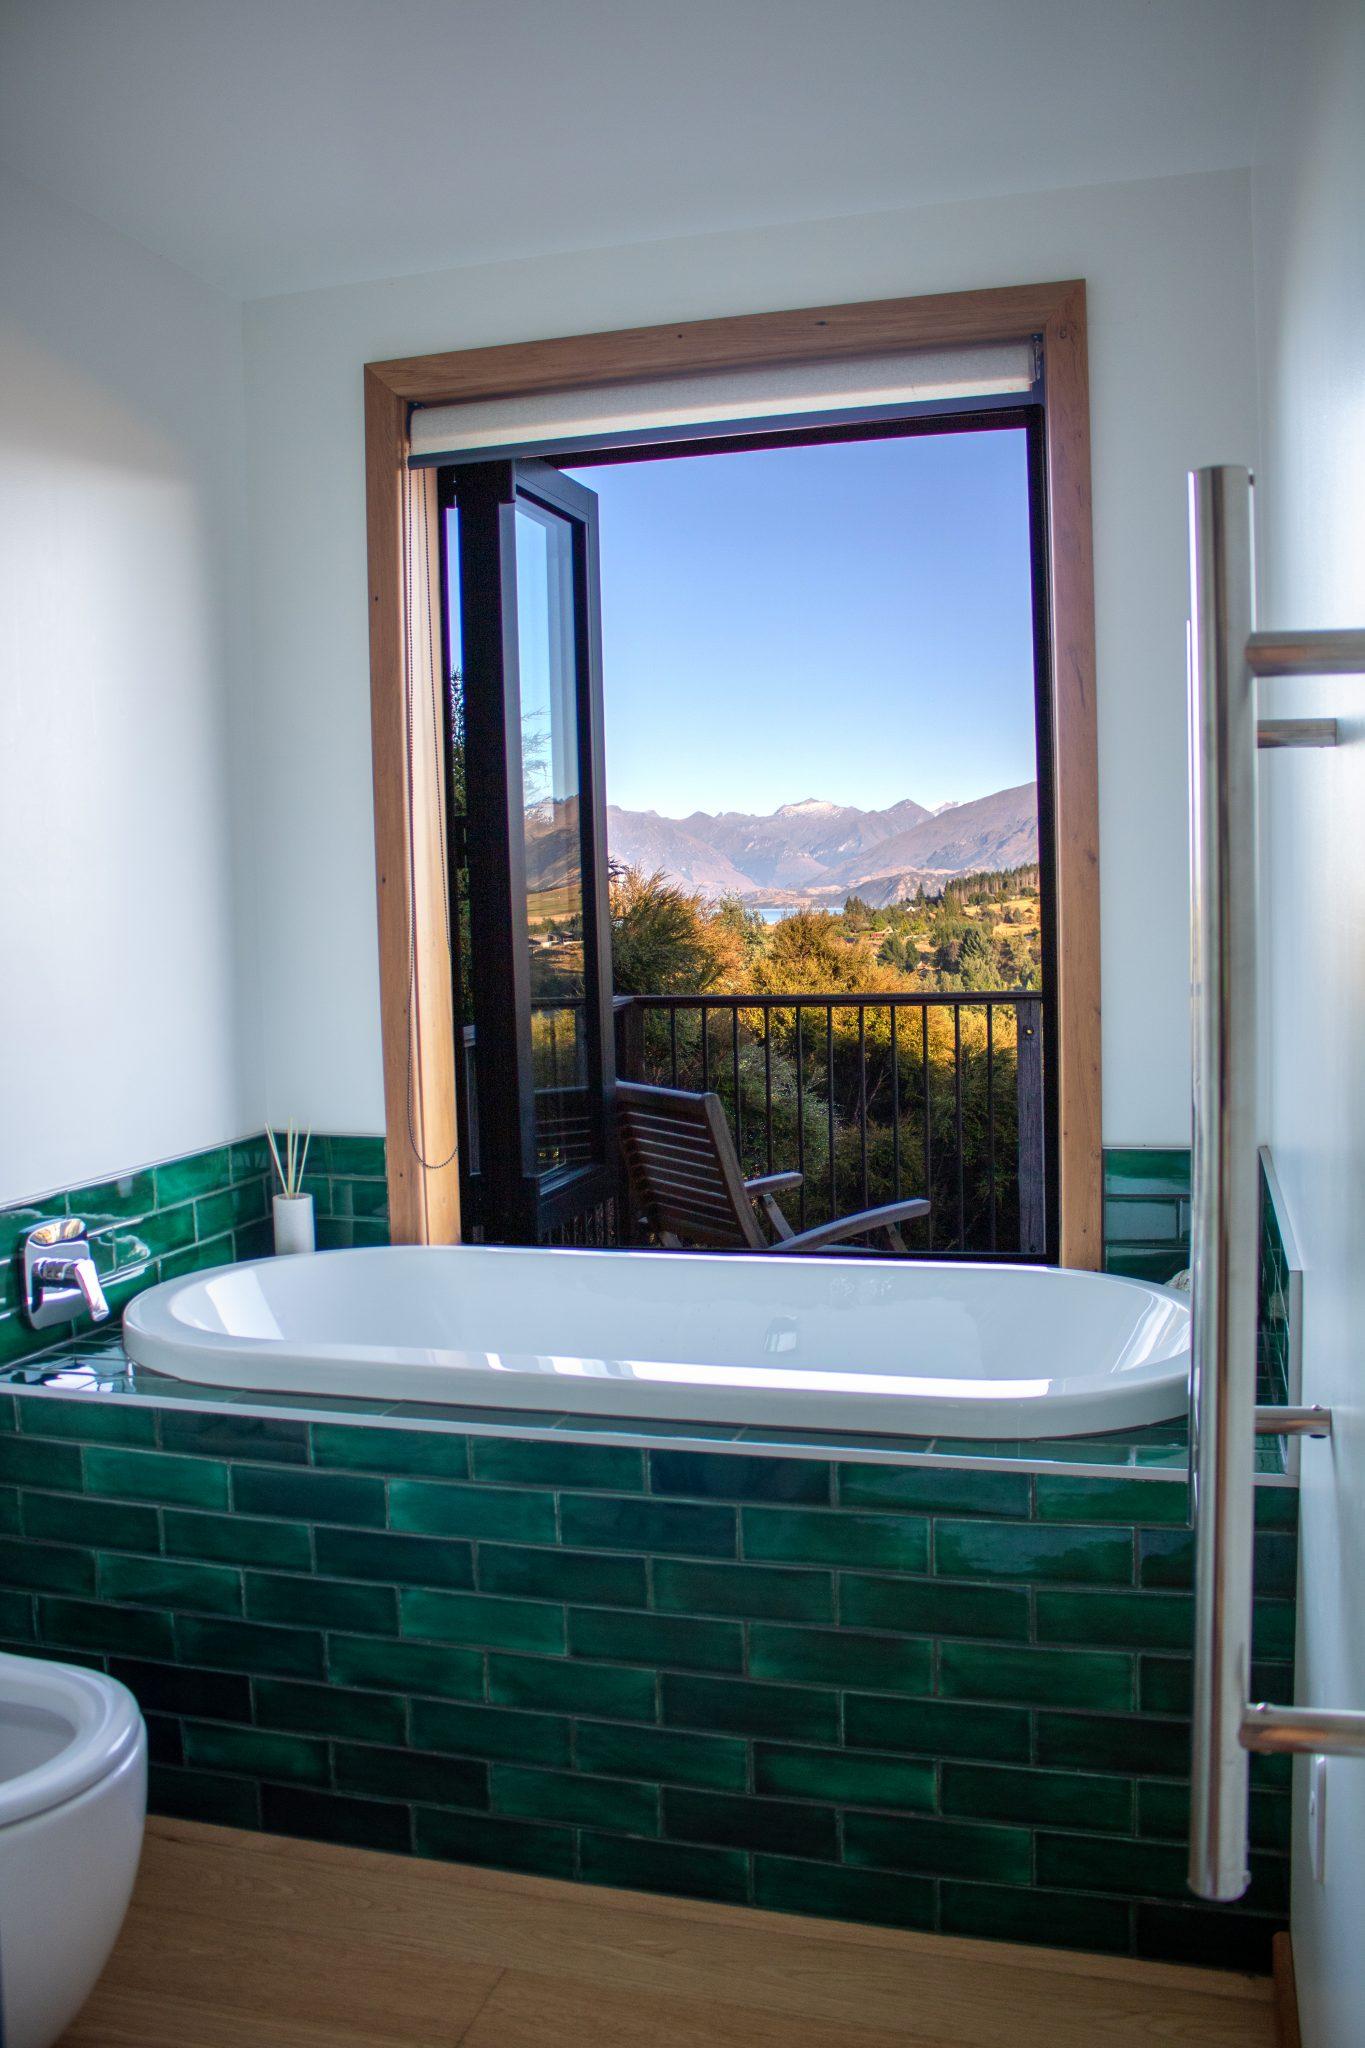 Wanaka Airbnb bathtub with a view